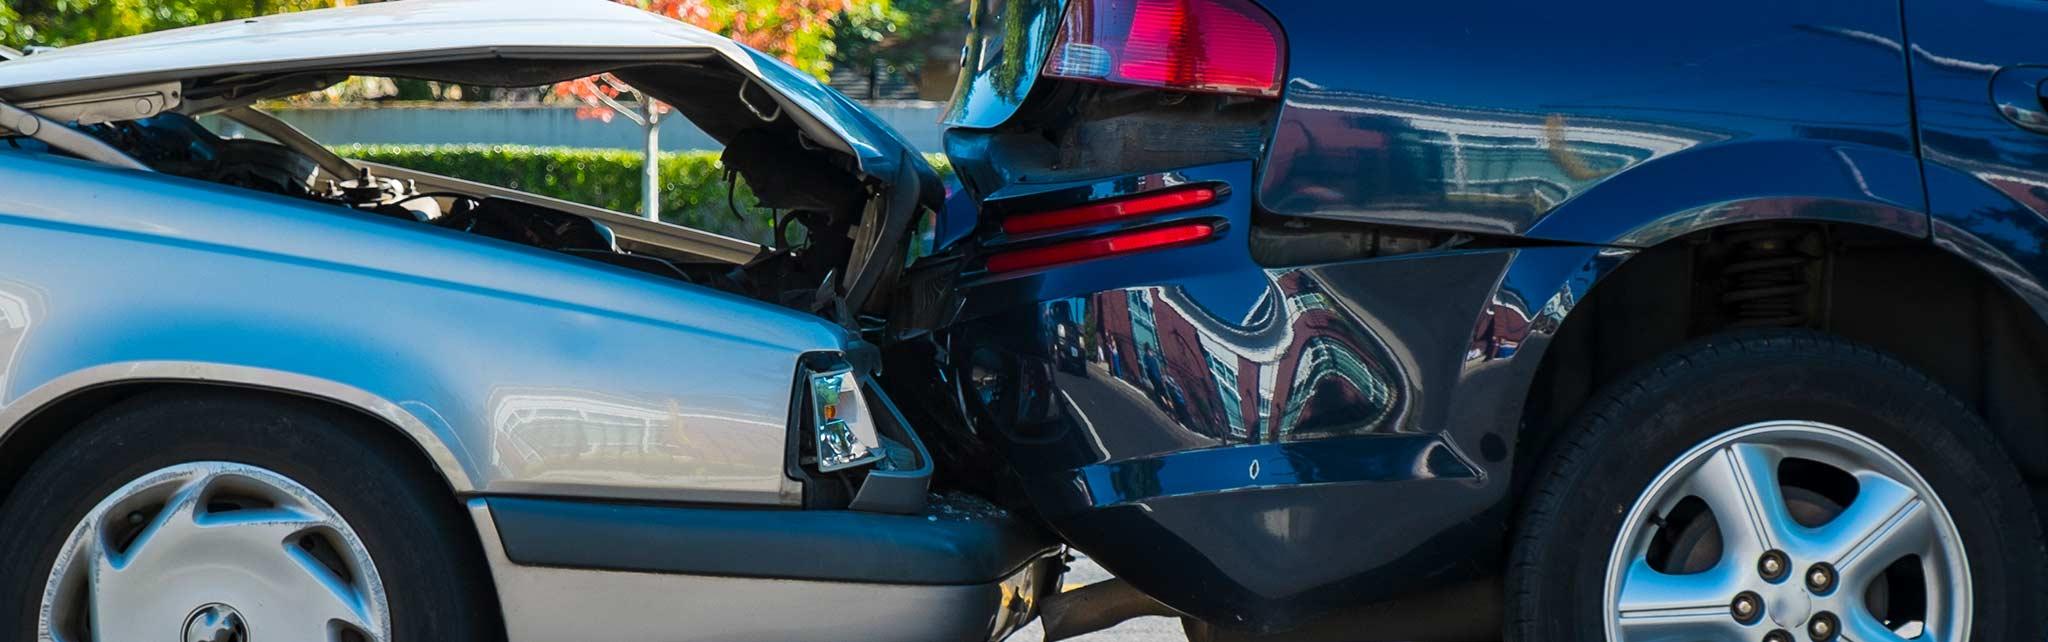 kopis-law-auto-injuries